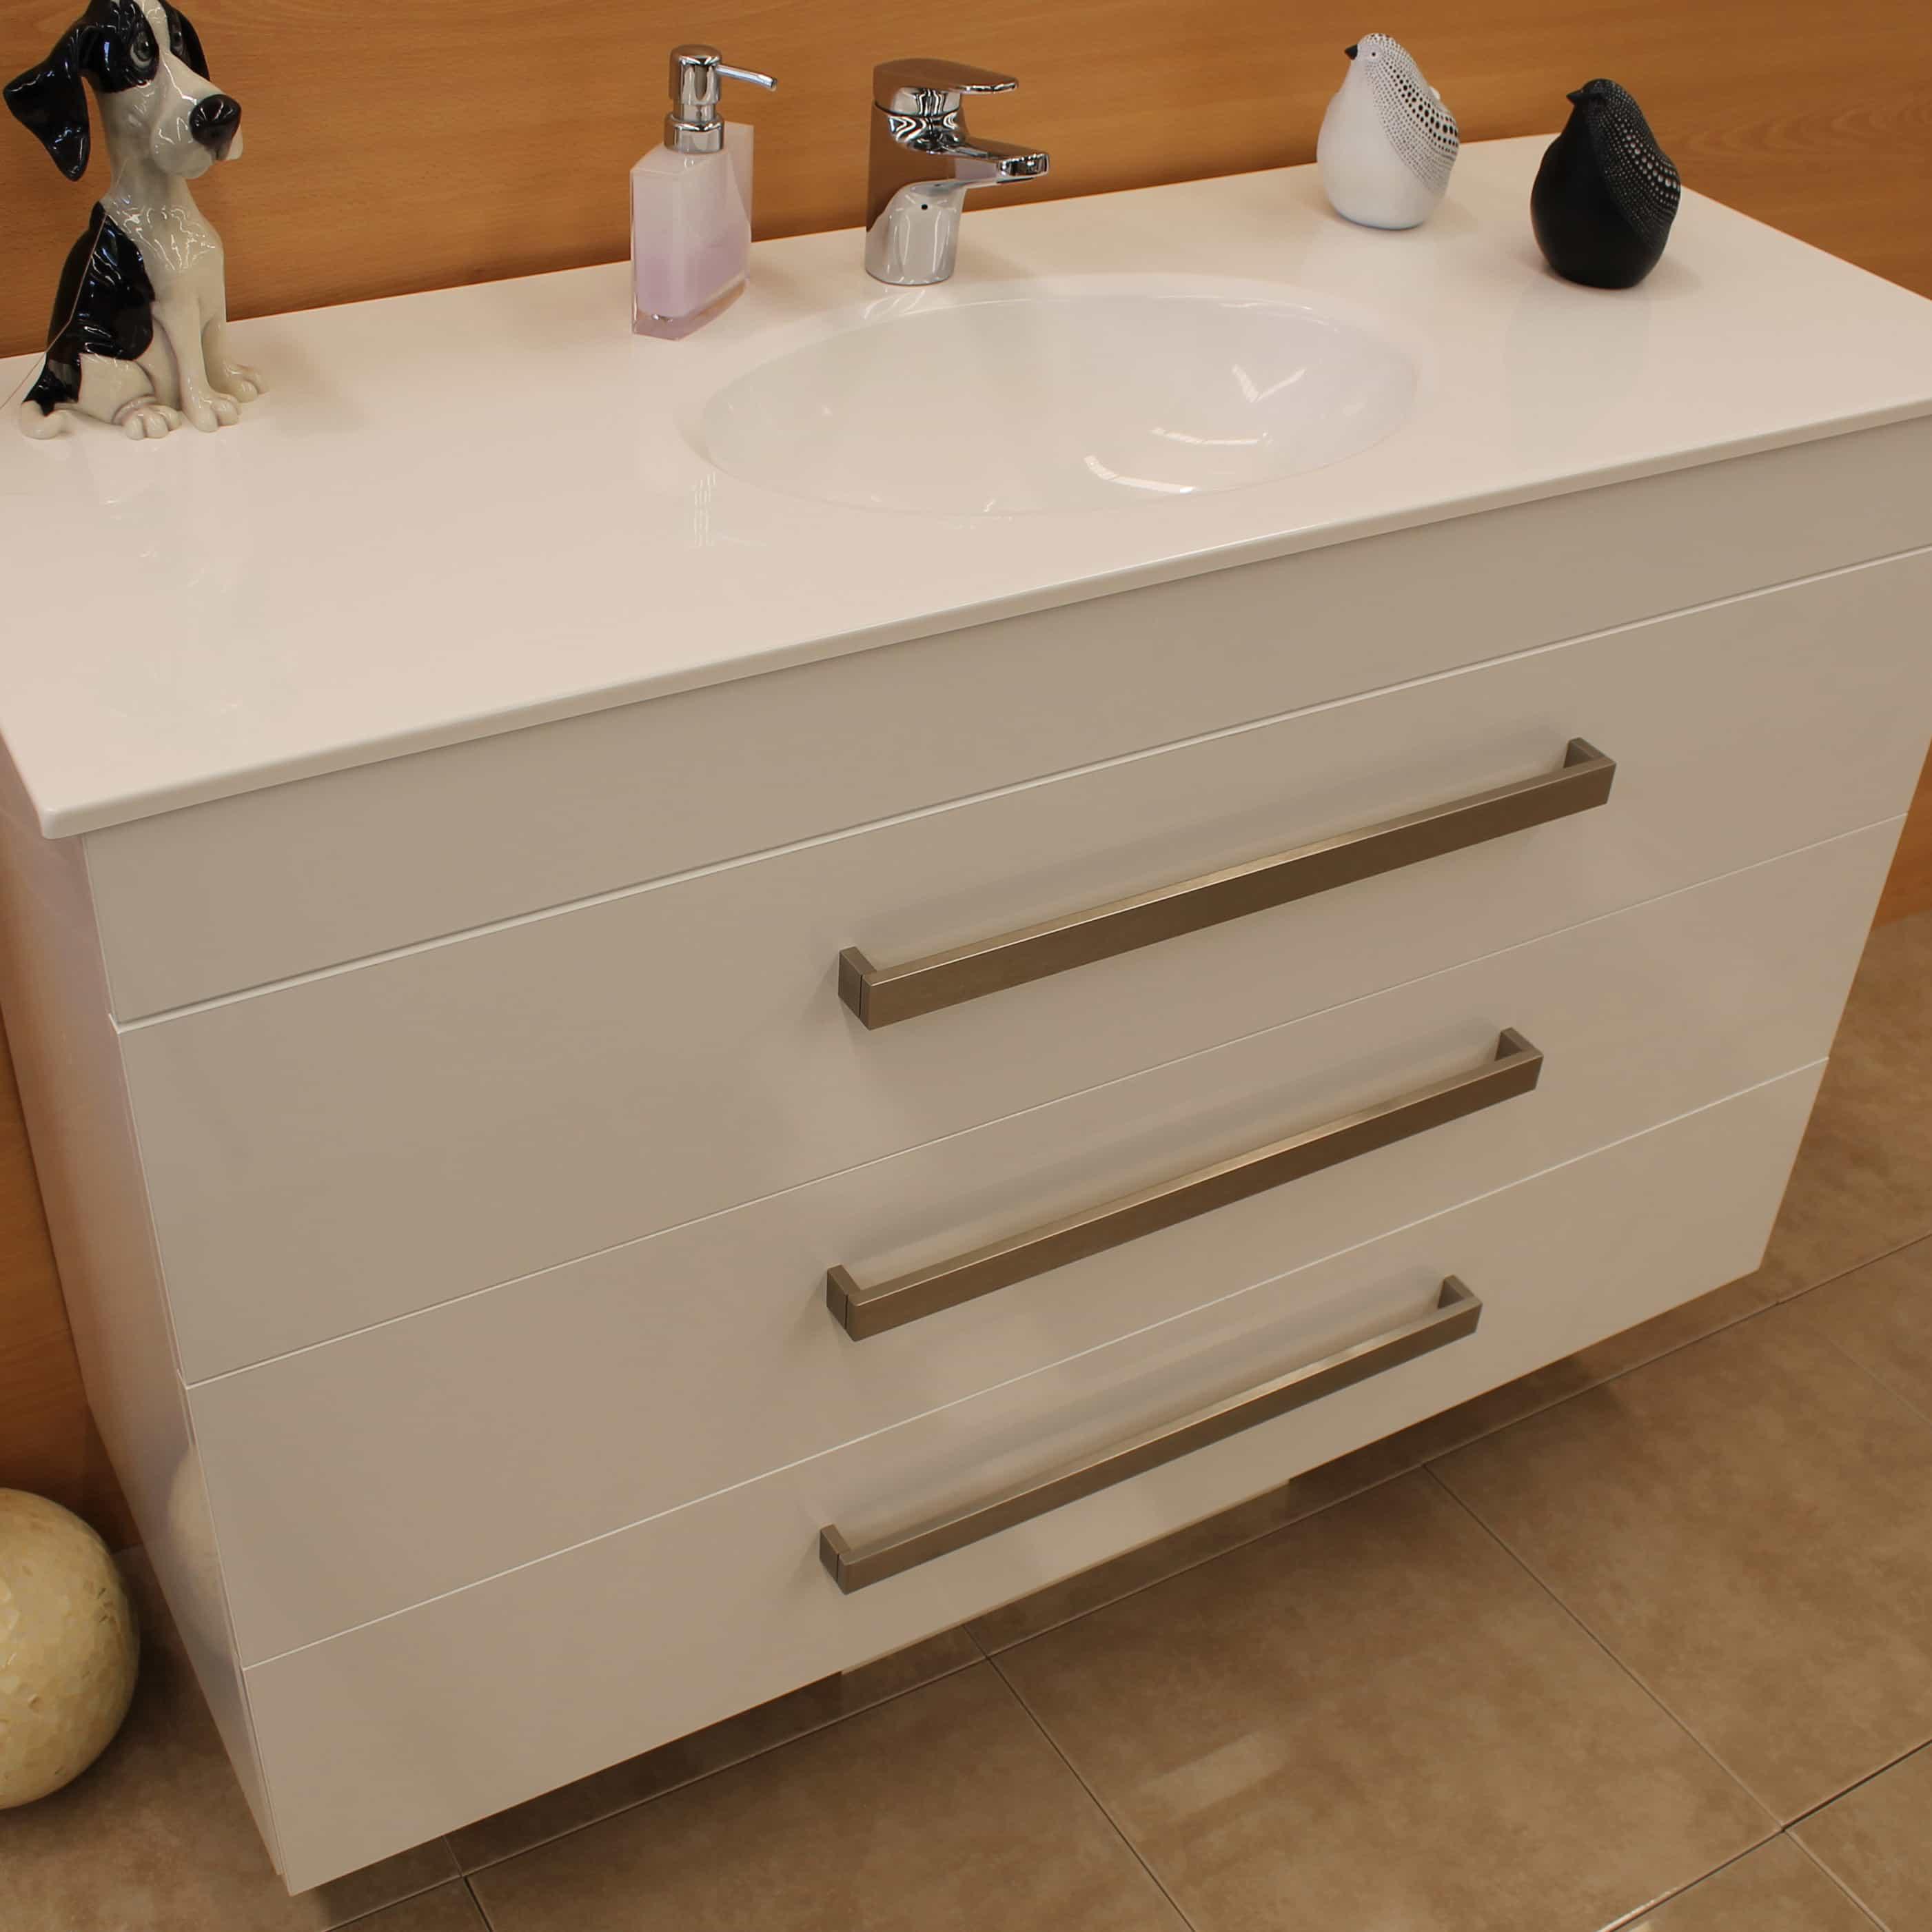 Bathroom Renovations Hawkesbury showerama – hawkesbury drawer unit with kickboard or extended wall